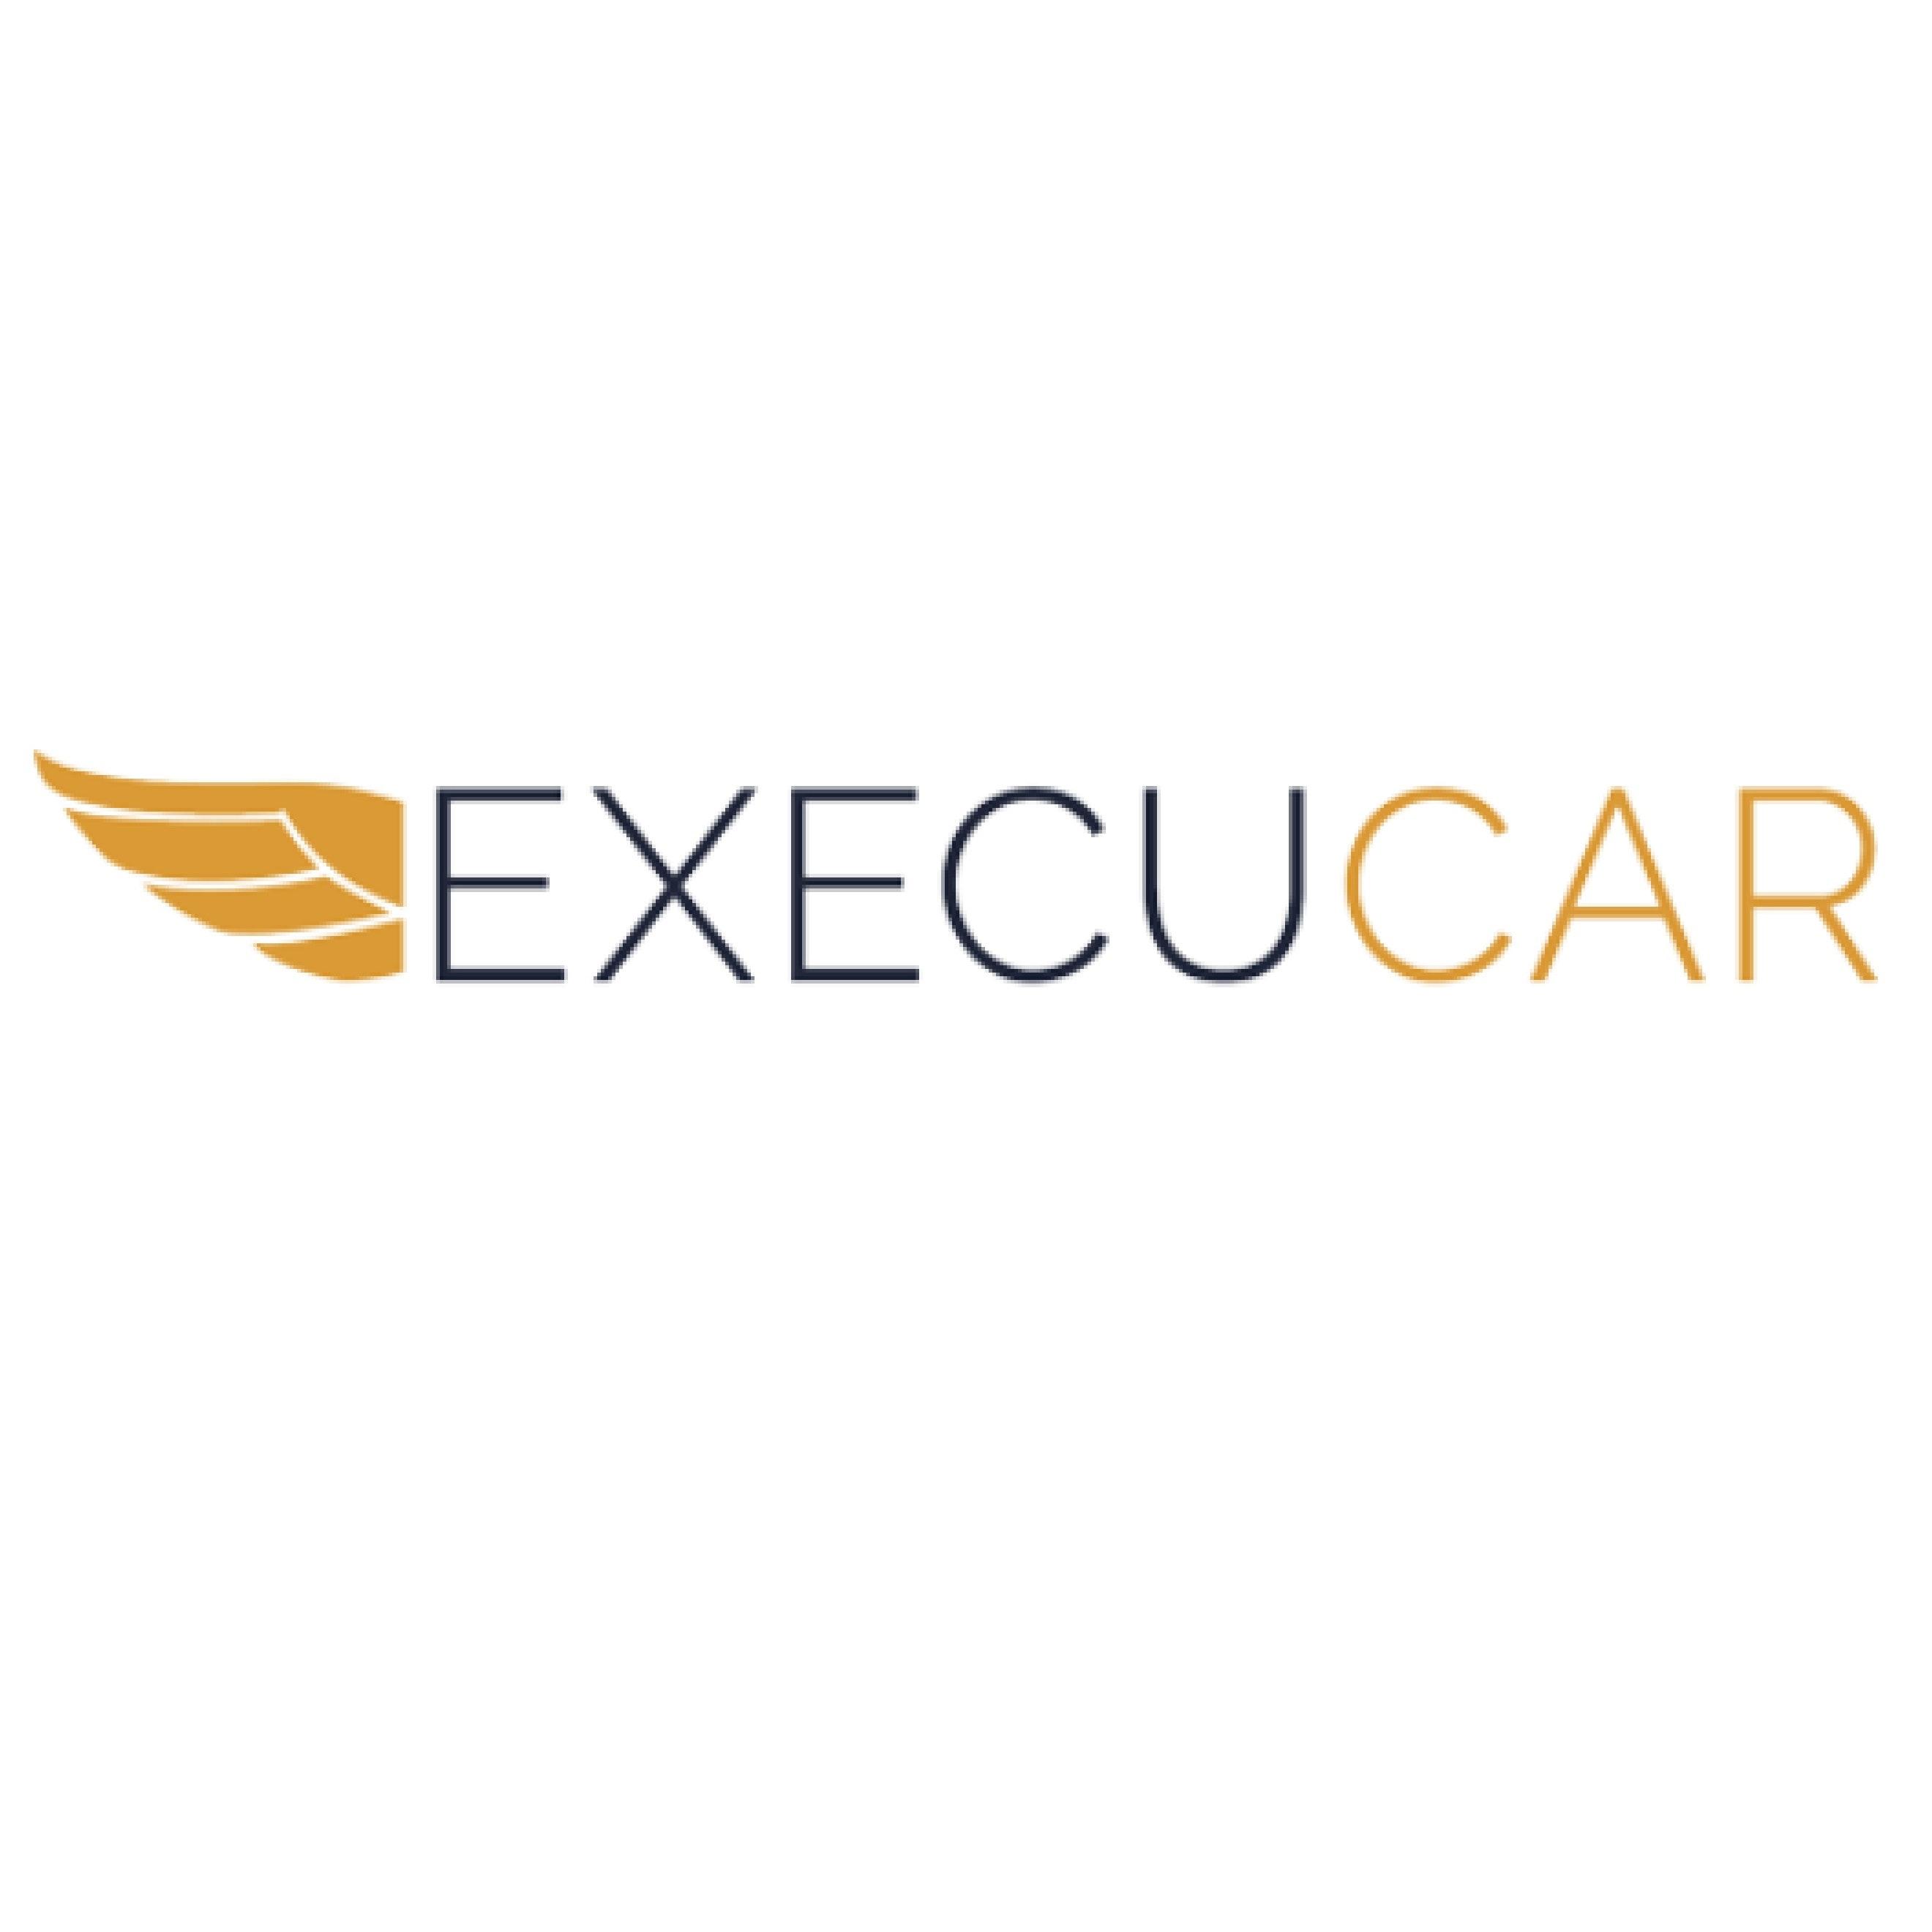 Execucar - Curbside logo